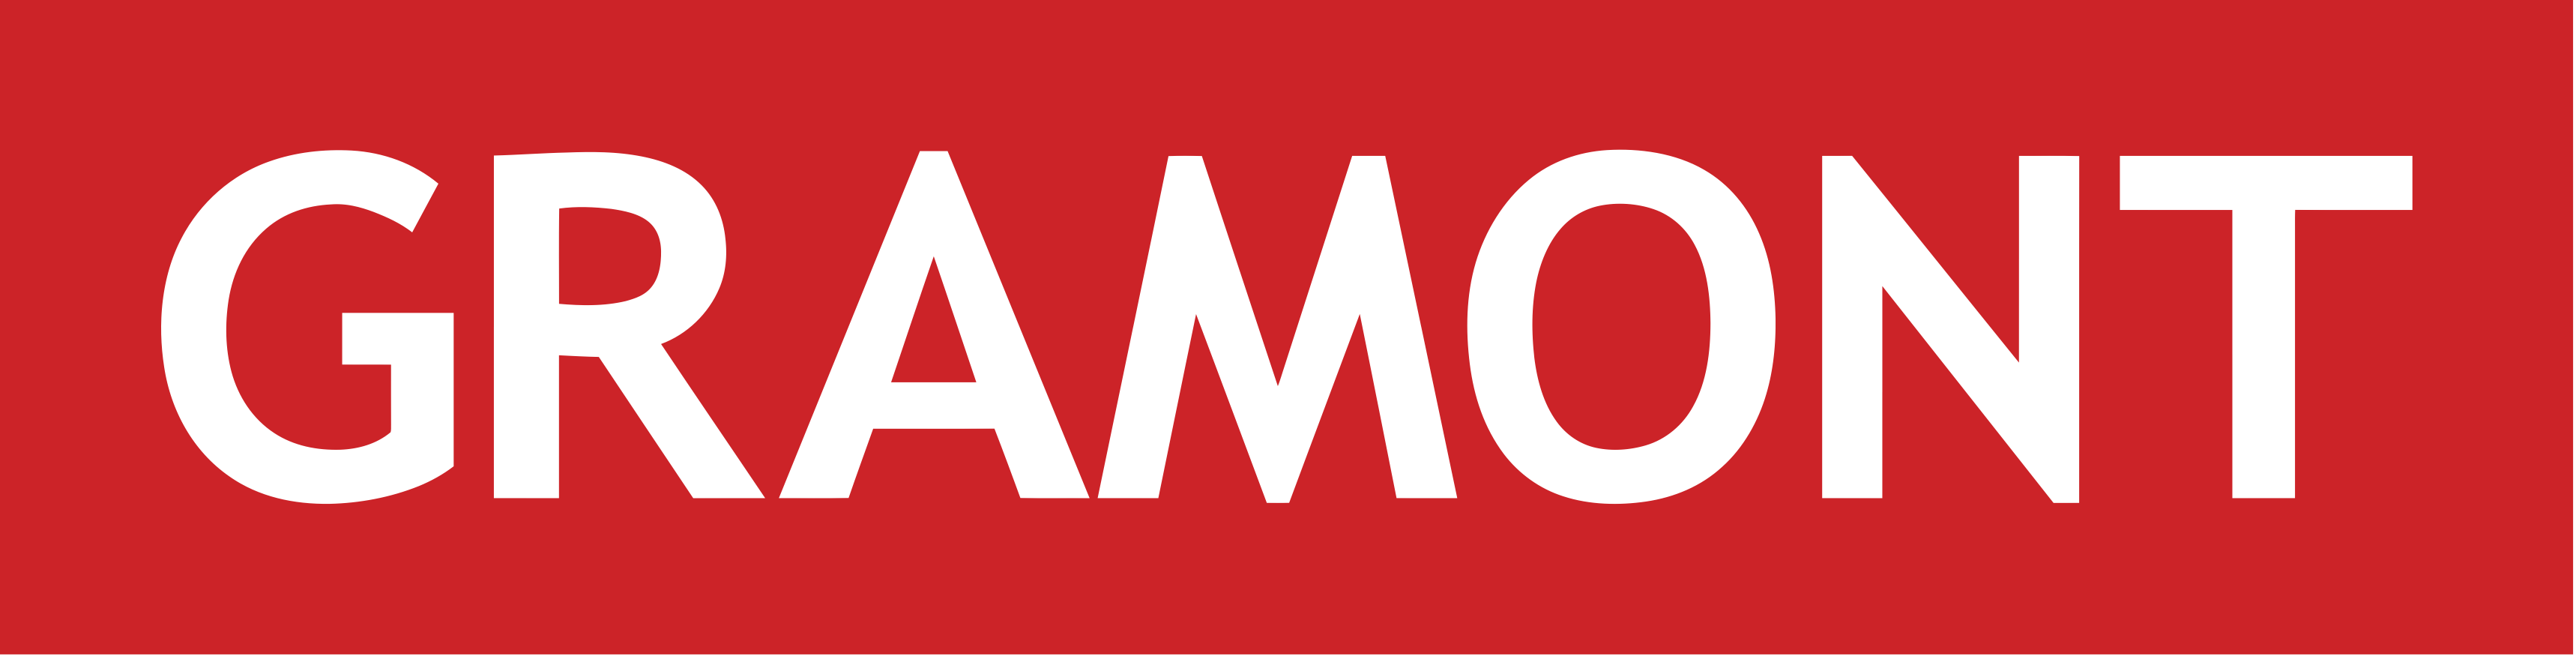 Gramont GmbH